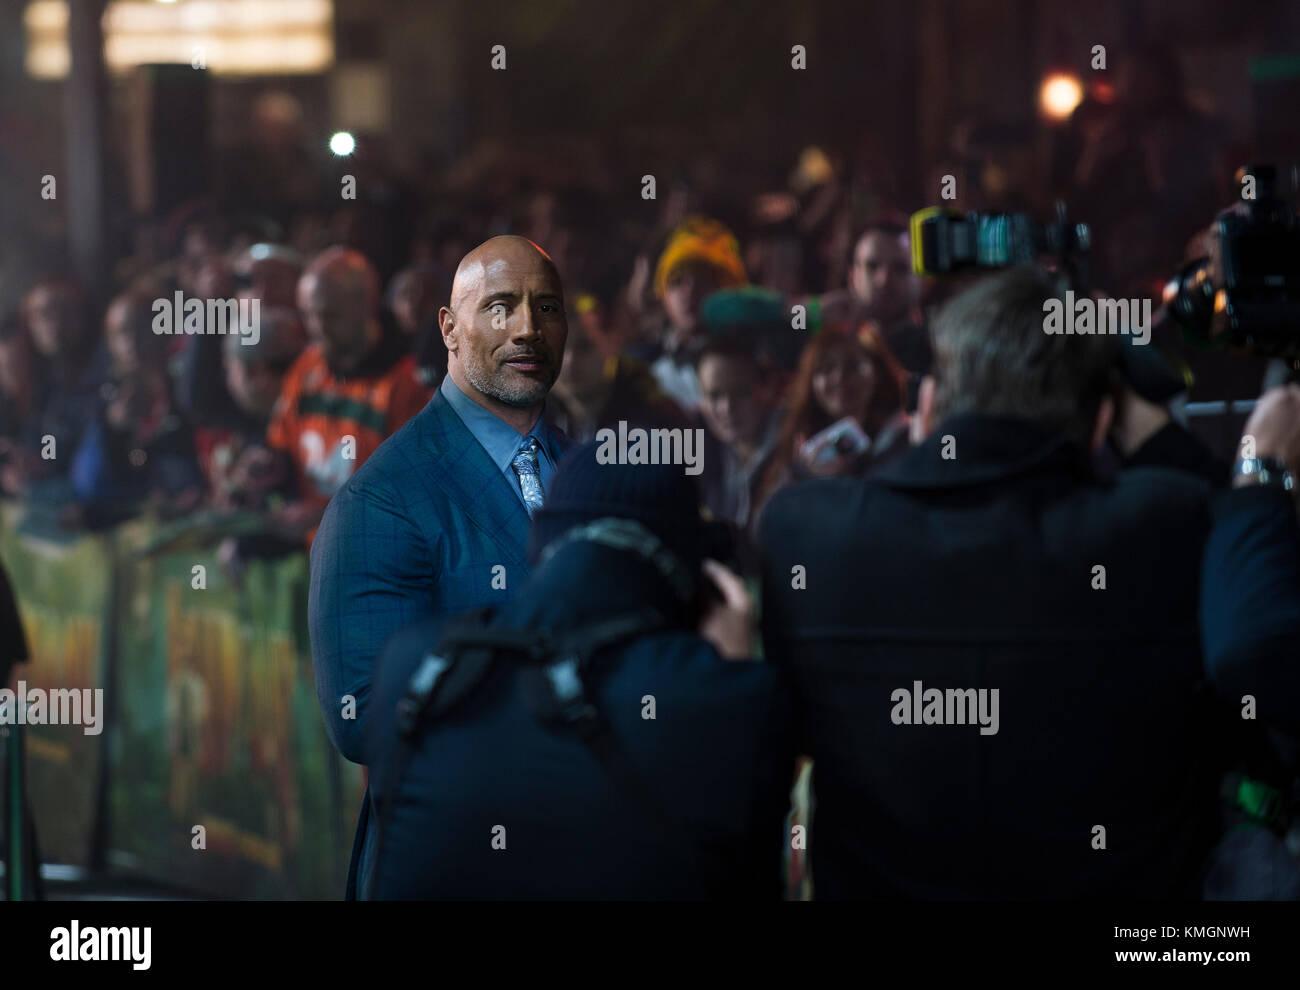 'Jumanji: Welcome To The Jungle UK Premiere - VIP Arrivals - Stock Image